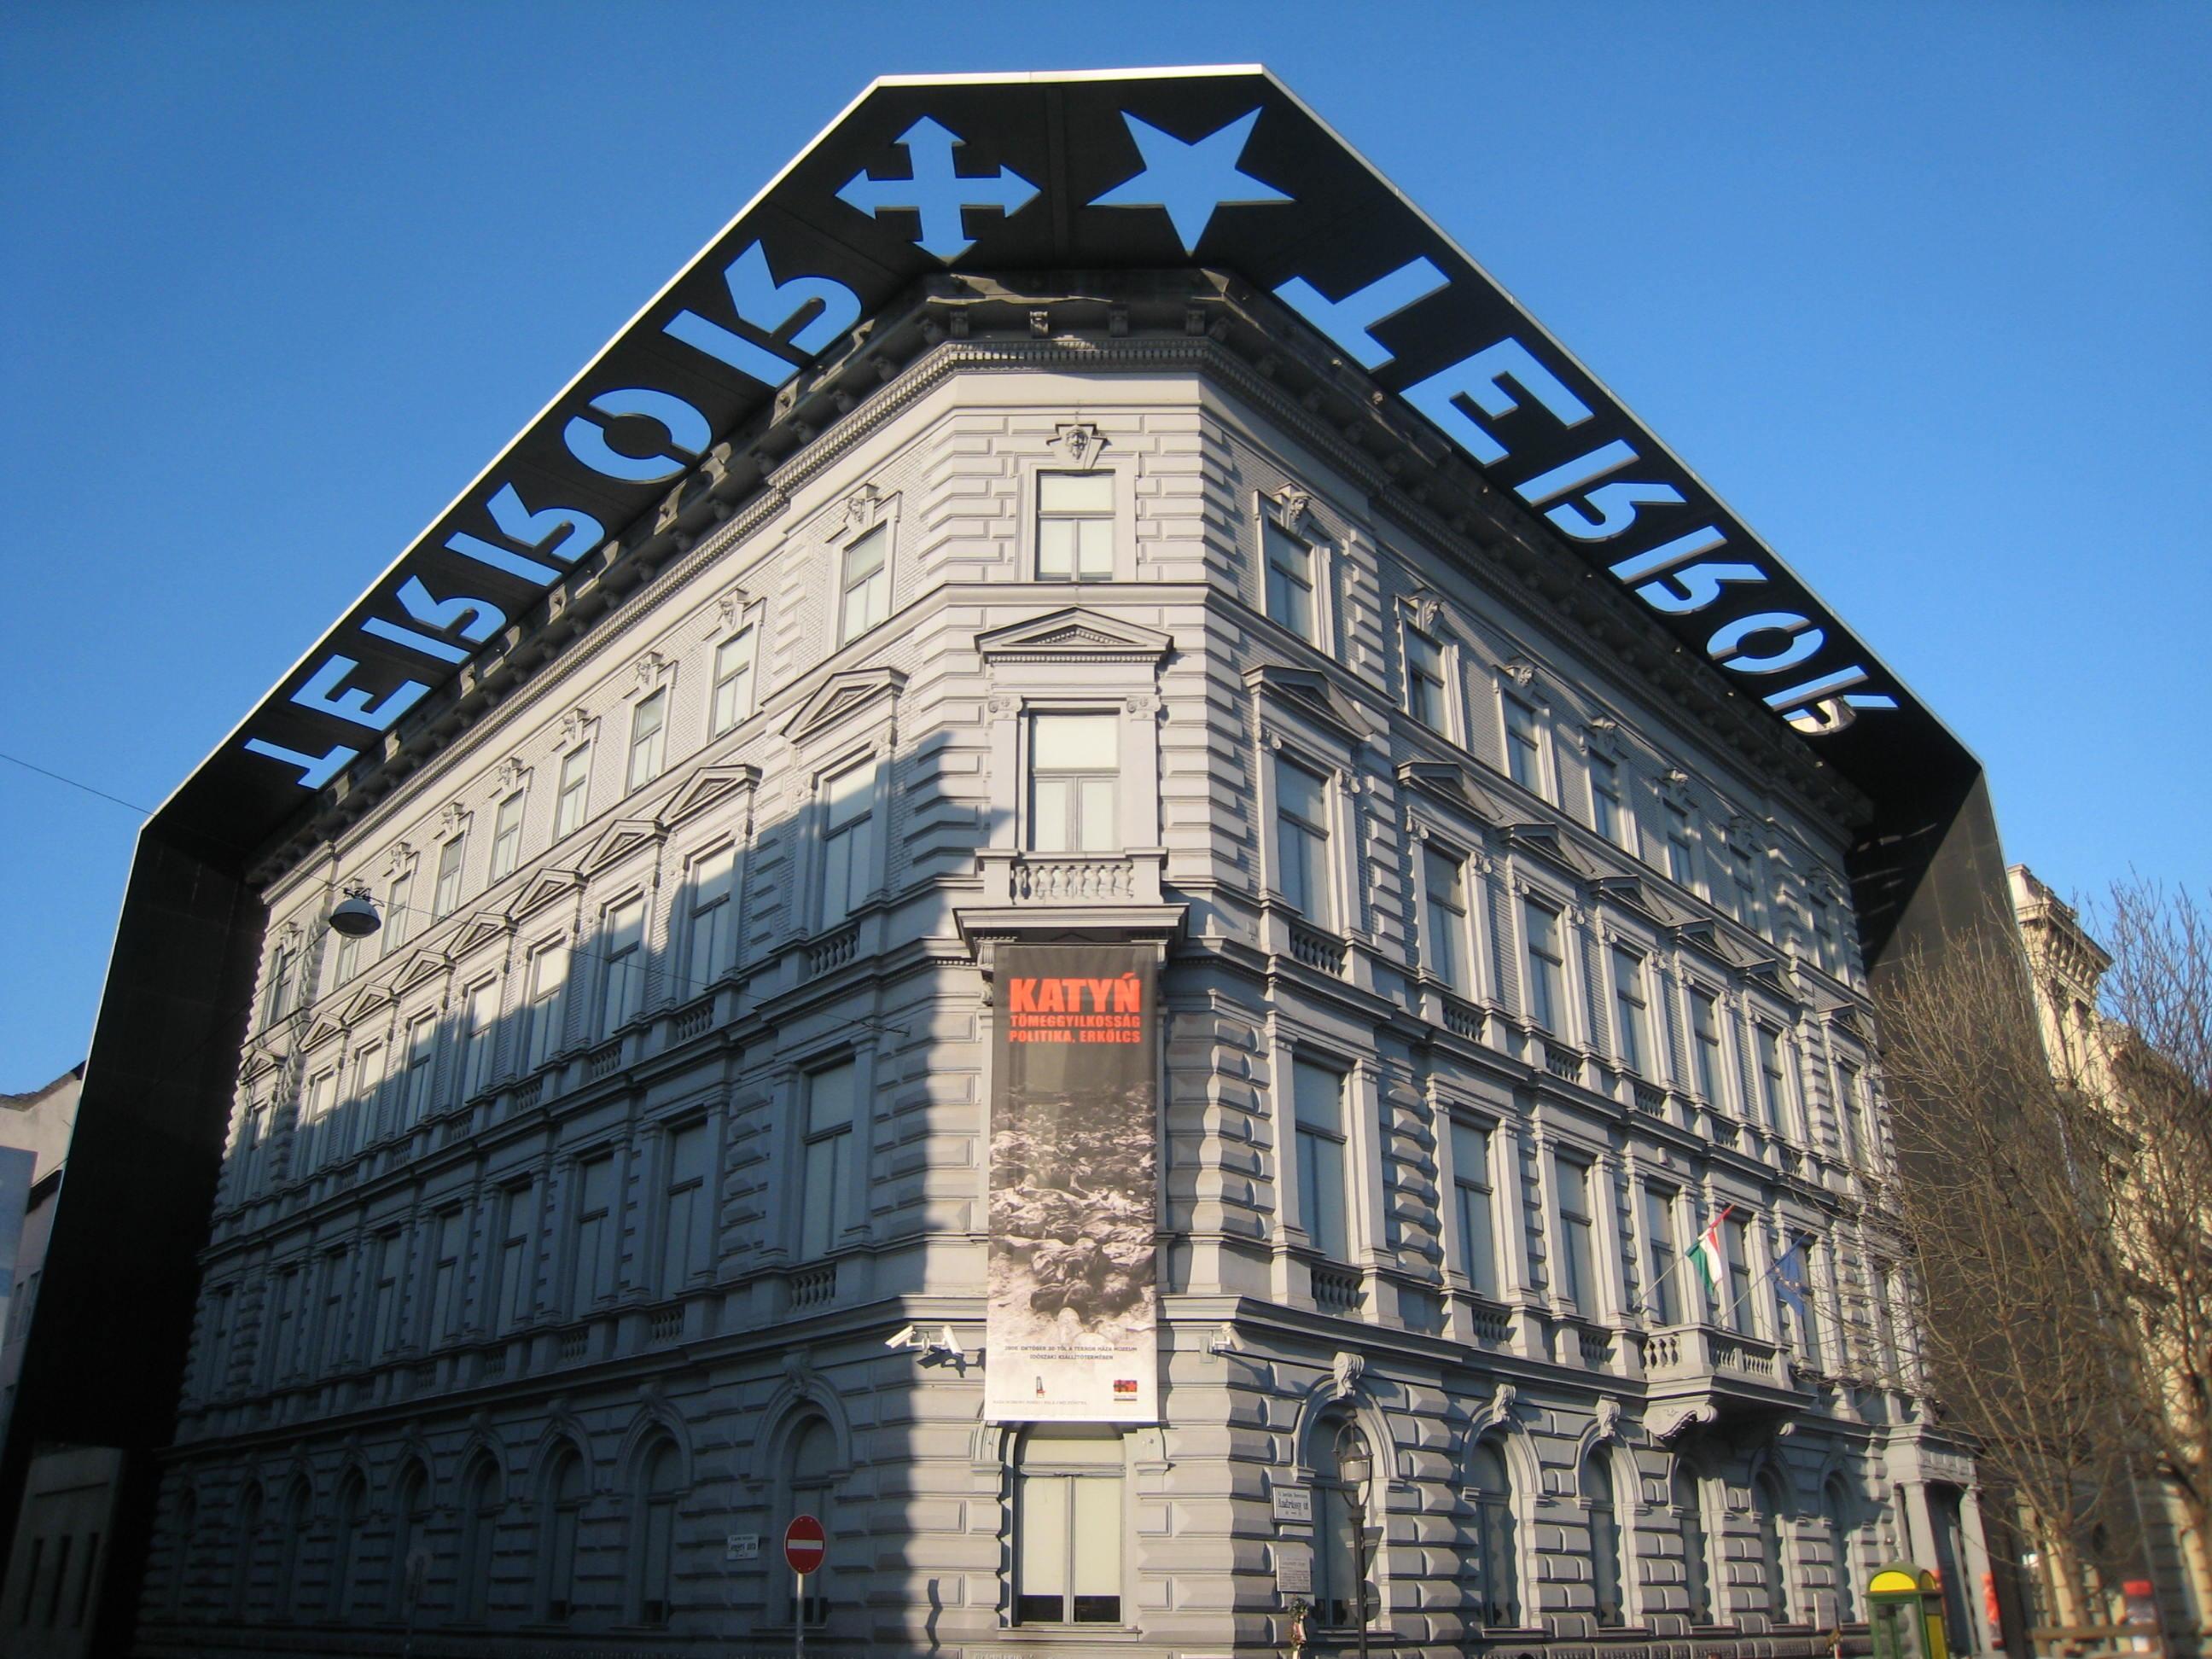 Terror Budapest Budapest Haus Des Terrors.jpg